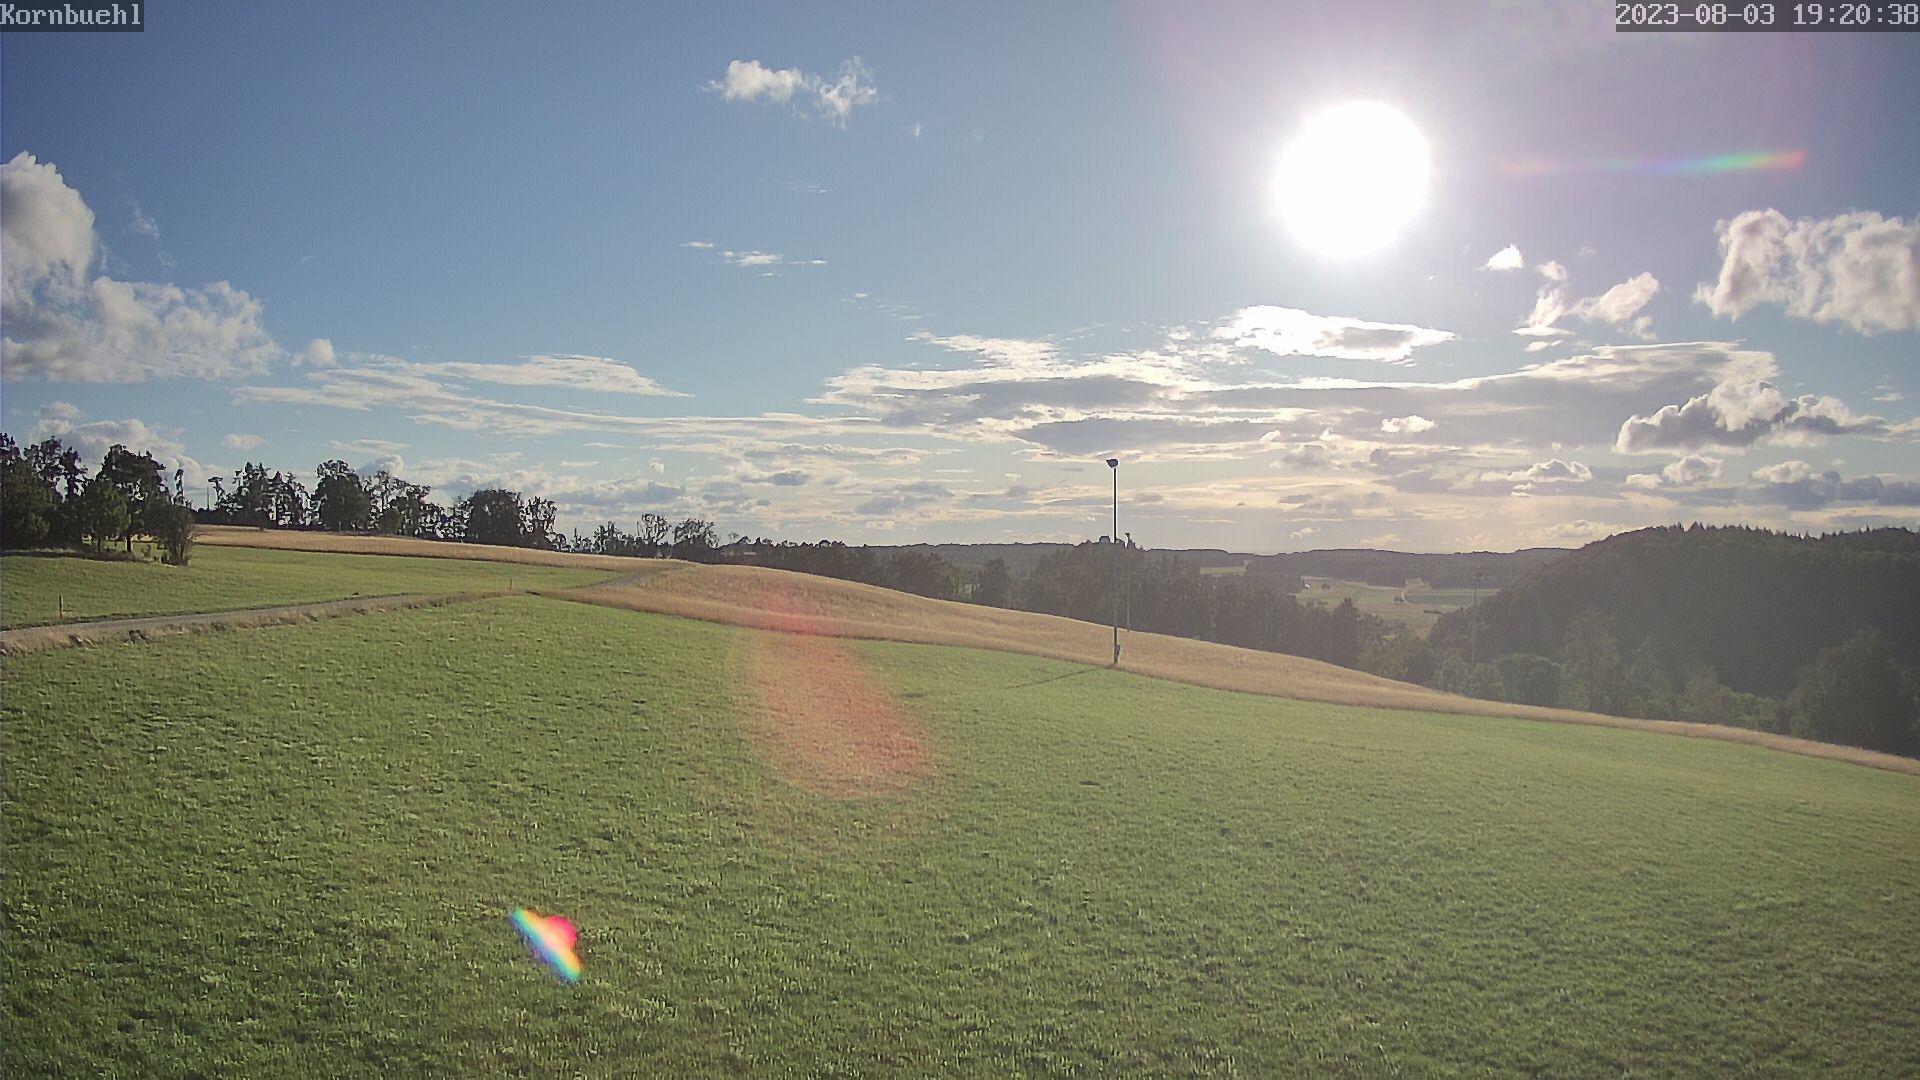 Webcam Ski Resort Salmendingen Swabian Jura